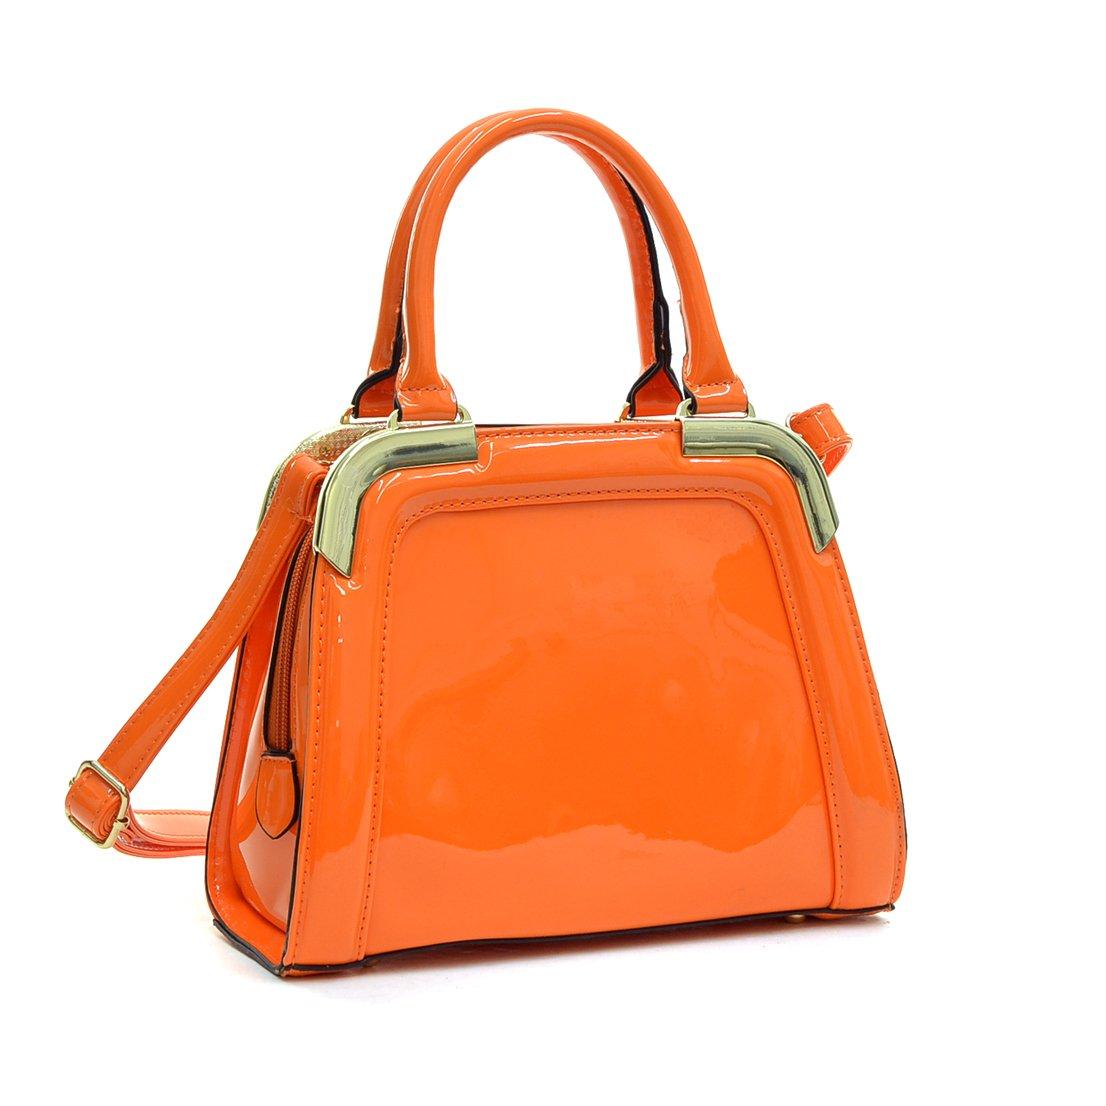 Vintage Handbags, Purses, Bags *New* Dasein Women Small Patent Leather Satchel Handbags Structured Purse Shoulder Bag $23.99 AT vintagedancer.com